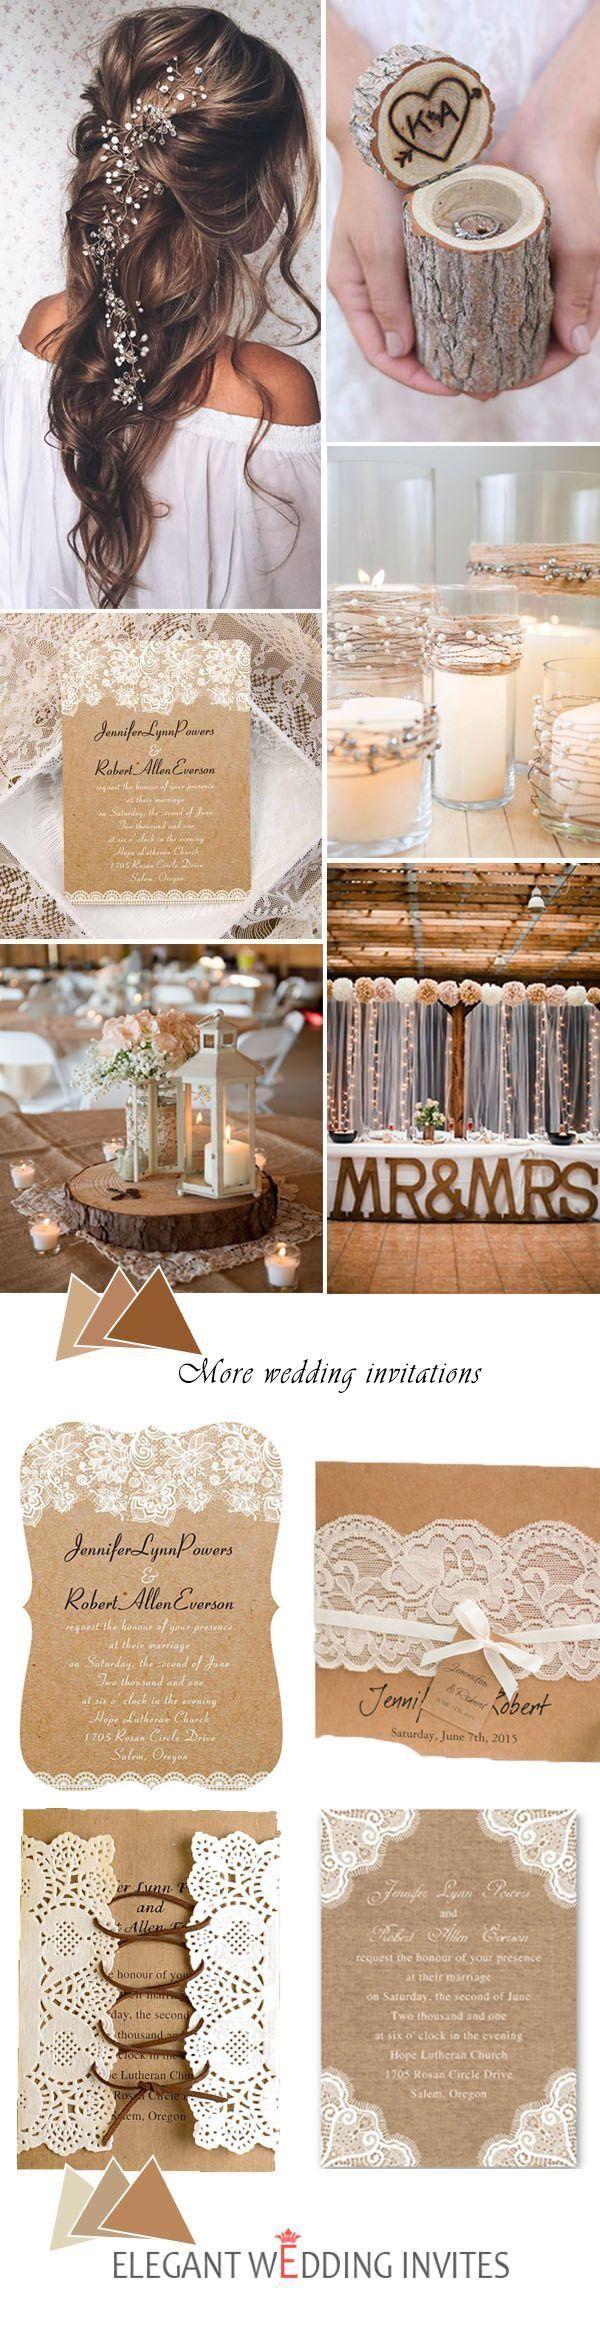 Wedding decorations in botswana january 2019  best Country style wedding images on Pinterest  Wedding ideas